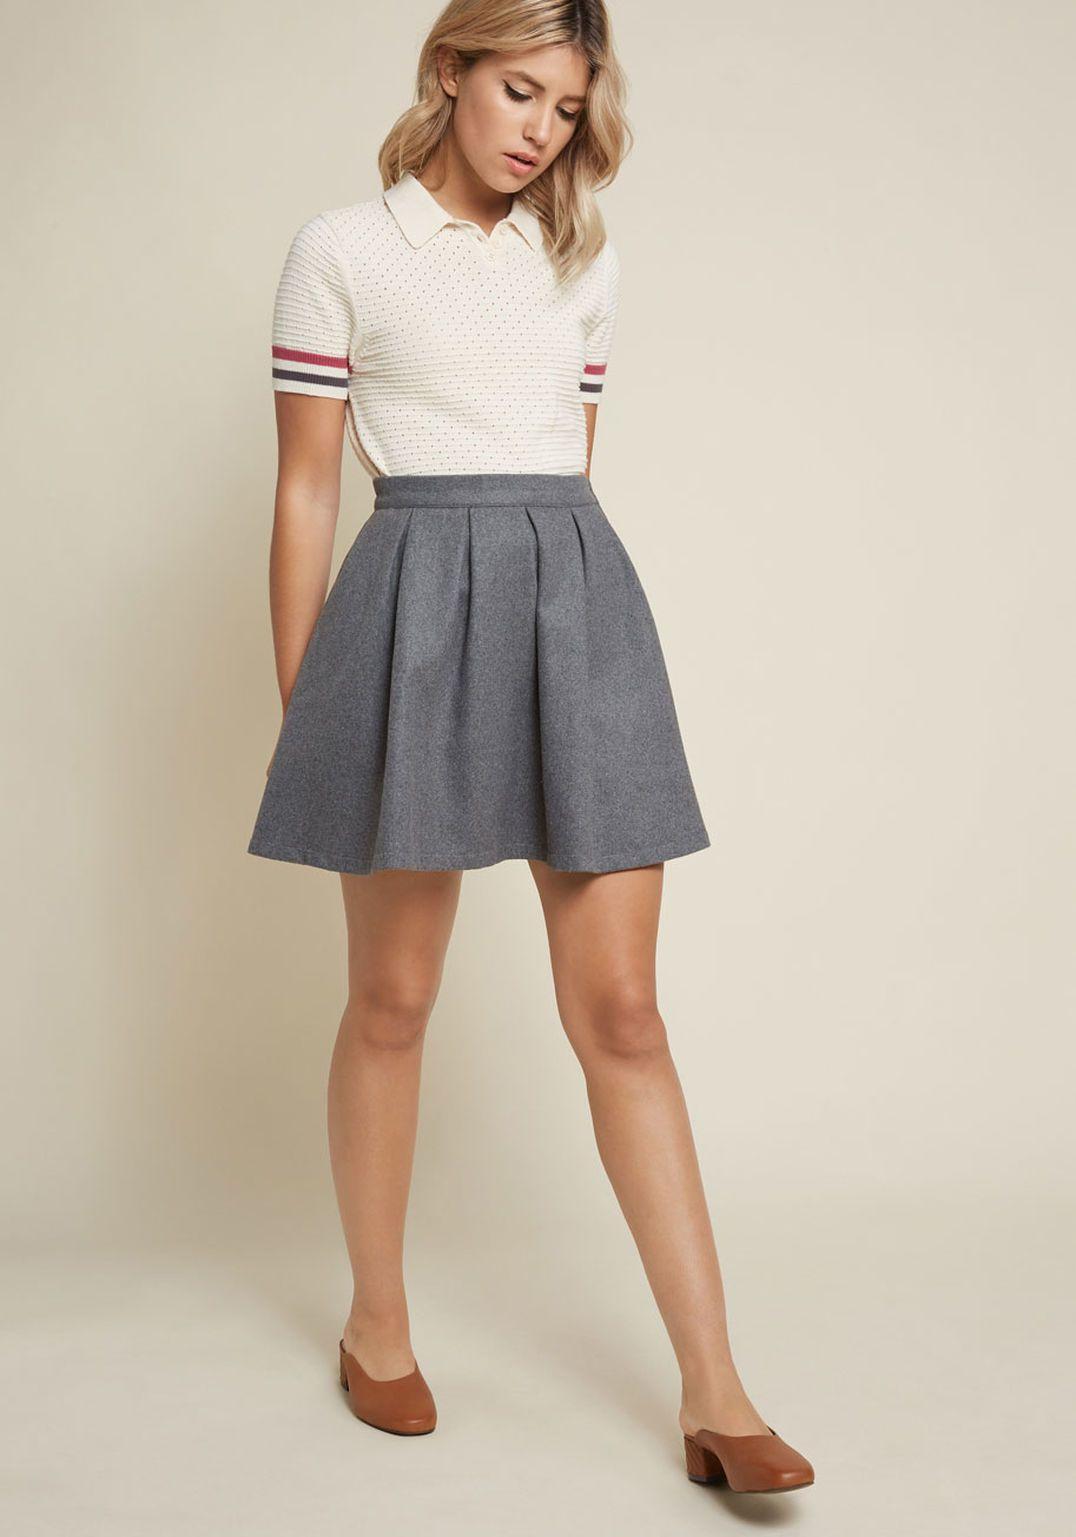 6499f4ec324 Brisk-Taker Wool Mini Skirt in Grey